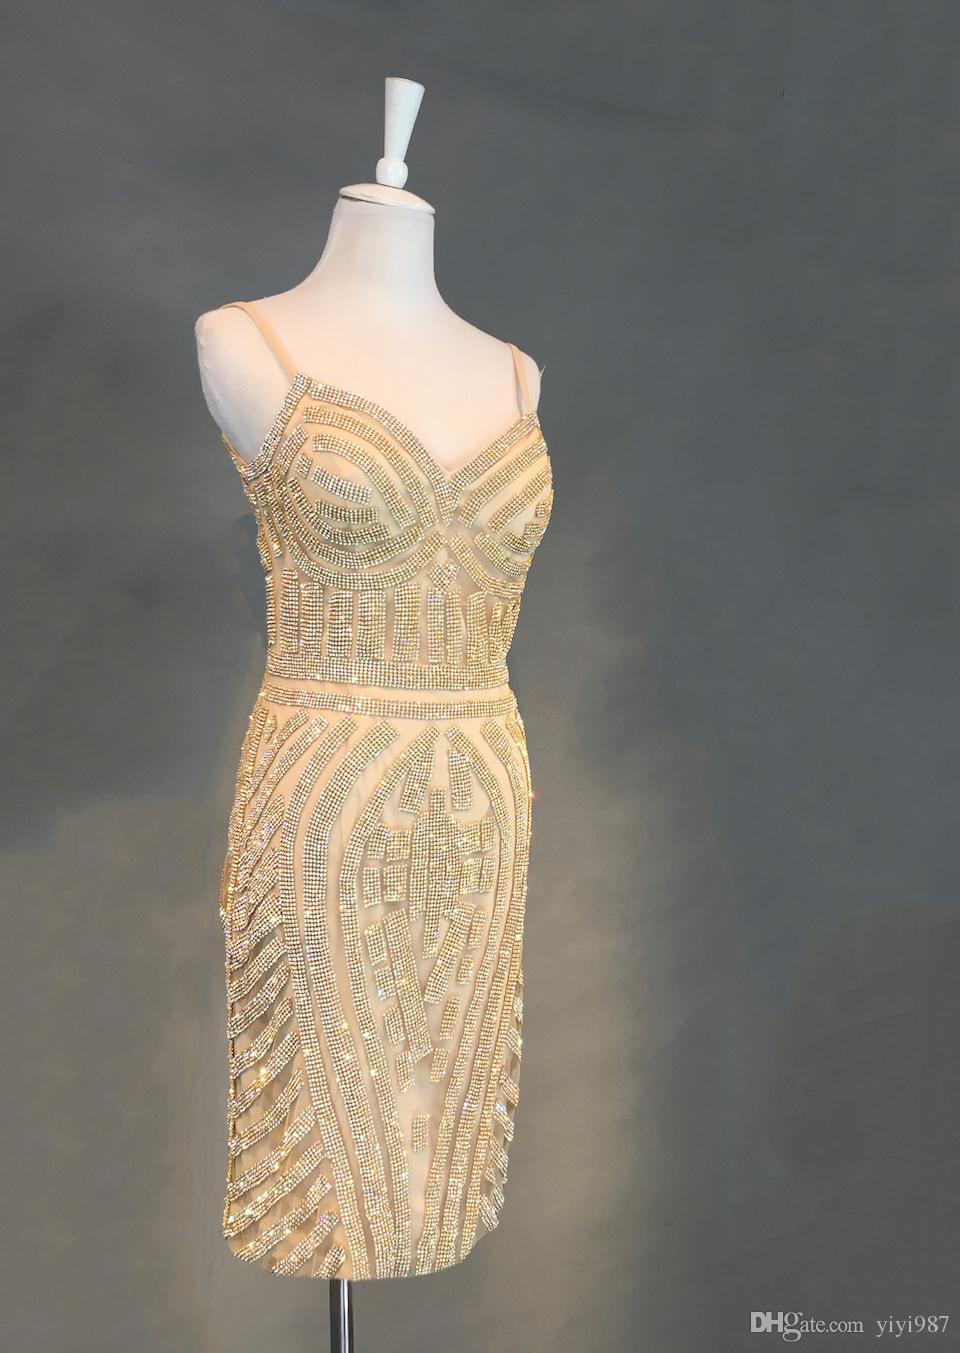 Real images Elegant Bleu Marine Sparkly Sequined Mermaid Court Soirée Dresse 2018 Couleur Or Champagne Pageant Illusion Prom Soirées Robes